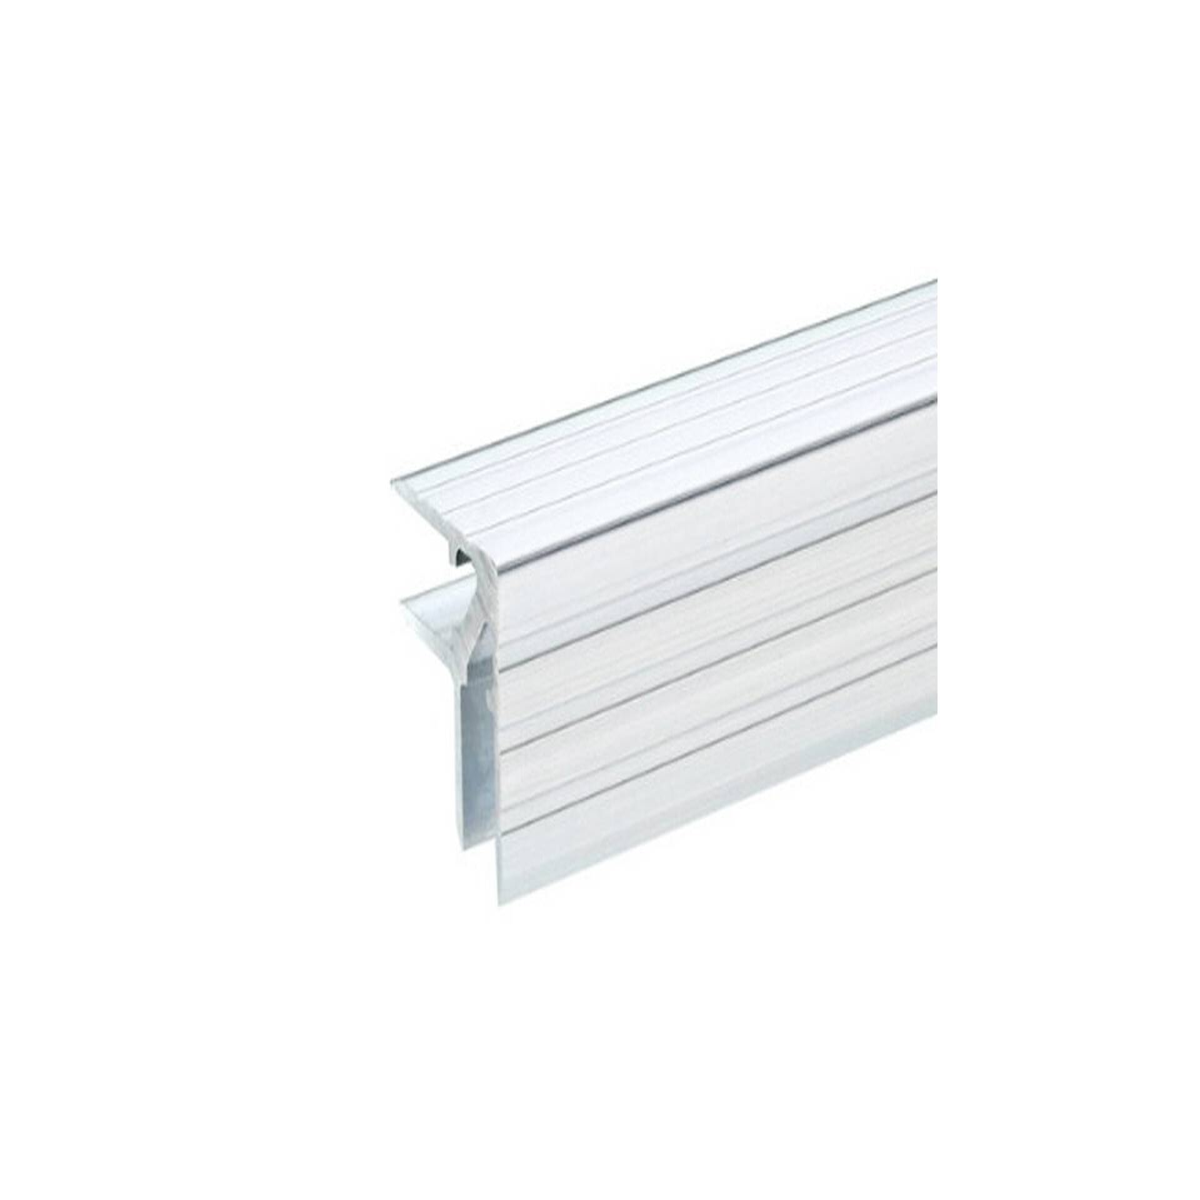 adam hall 6107 aluminium casemaker 9 5 mm einschub. Black Bedroom Furniture Sets. Home Design Ideas